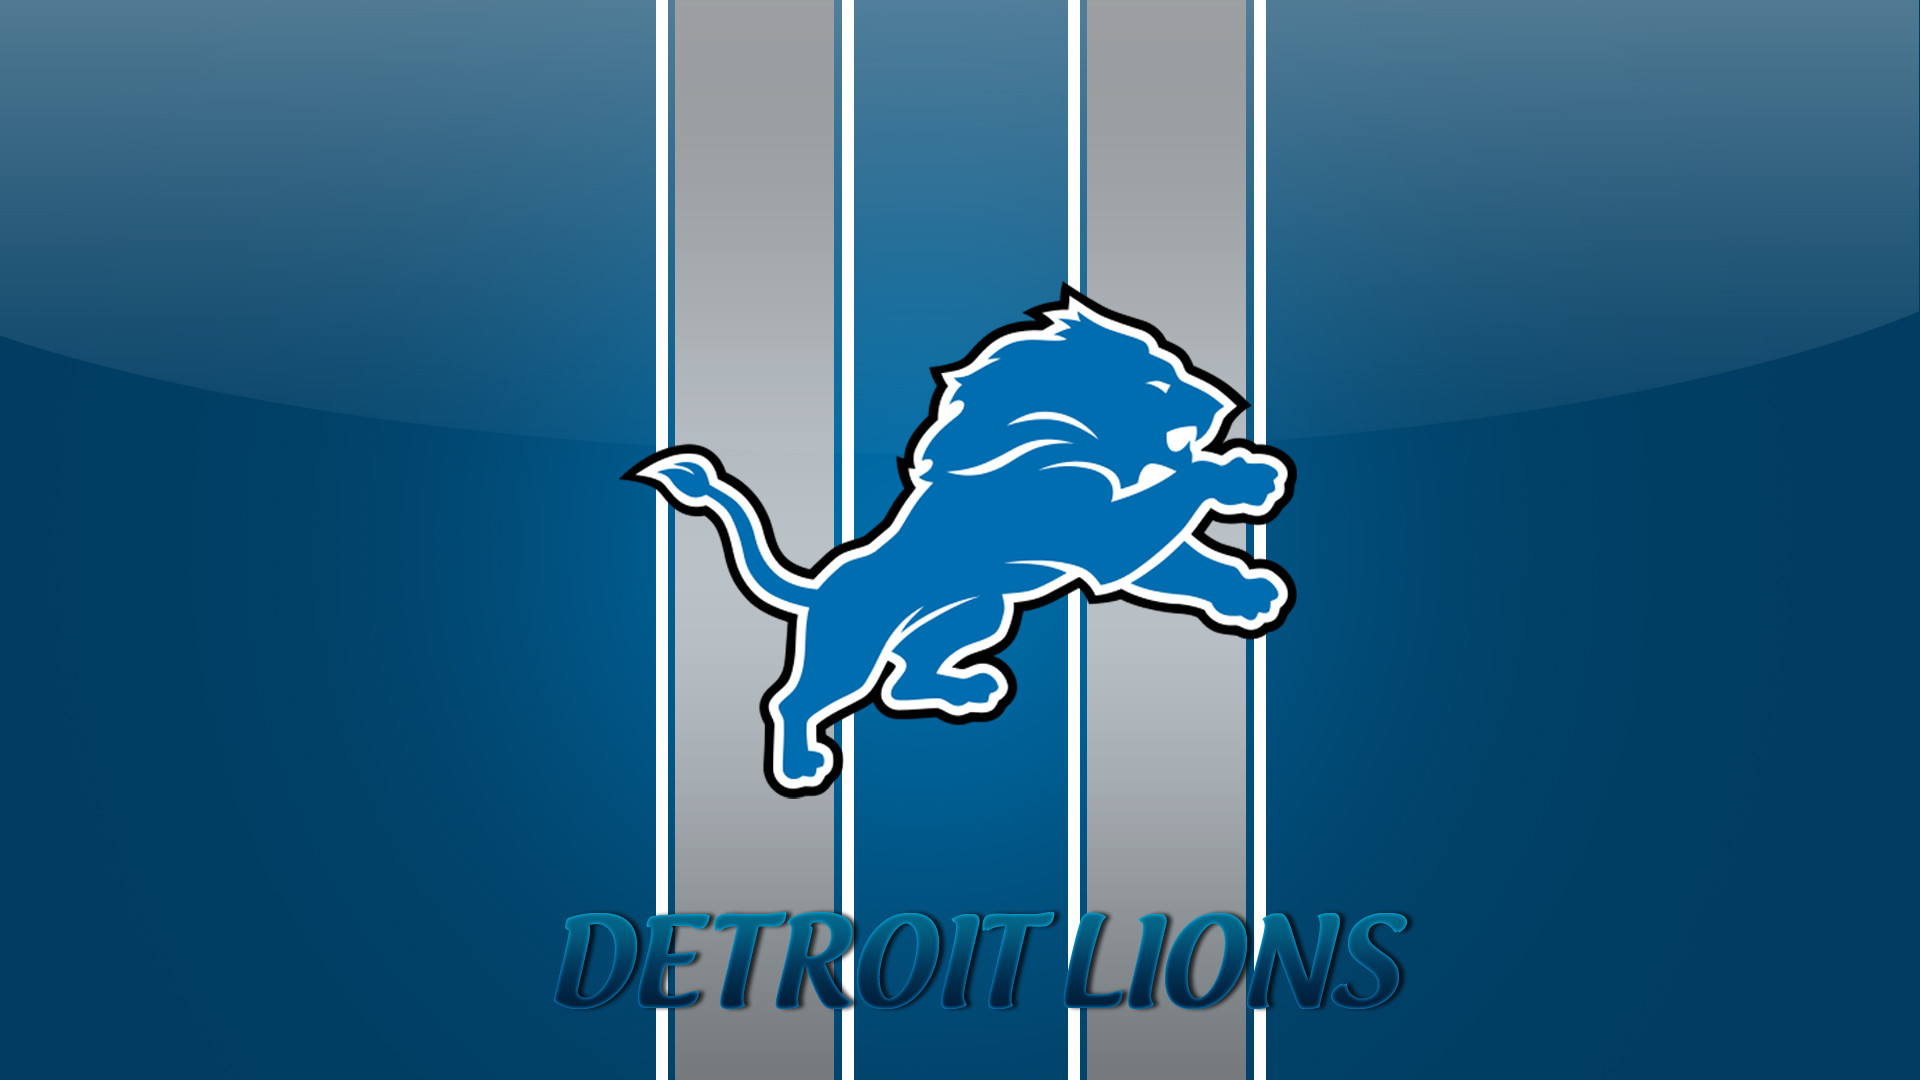 Detroit Lions HD Wallpaper Detroit Lions HD Wallpaper-1 .